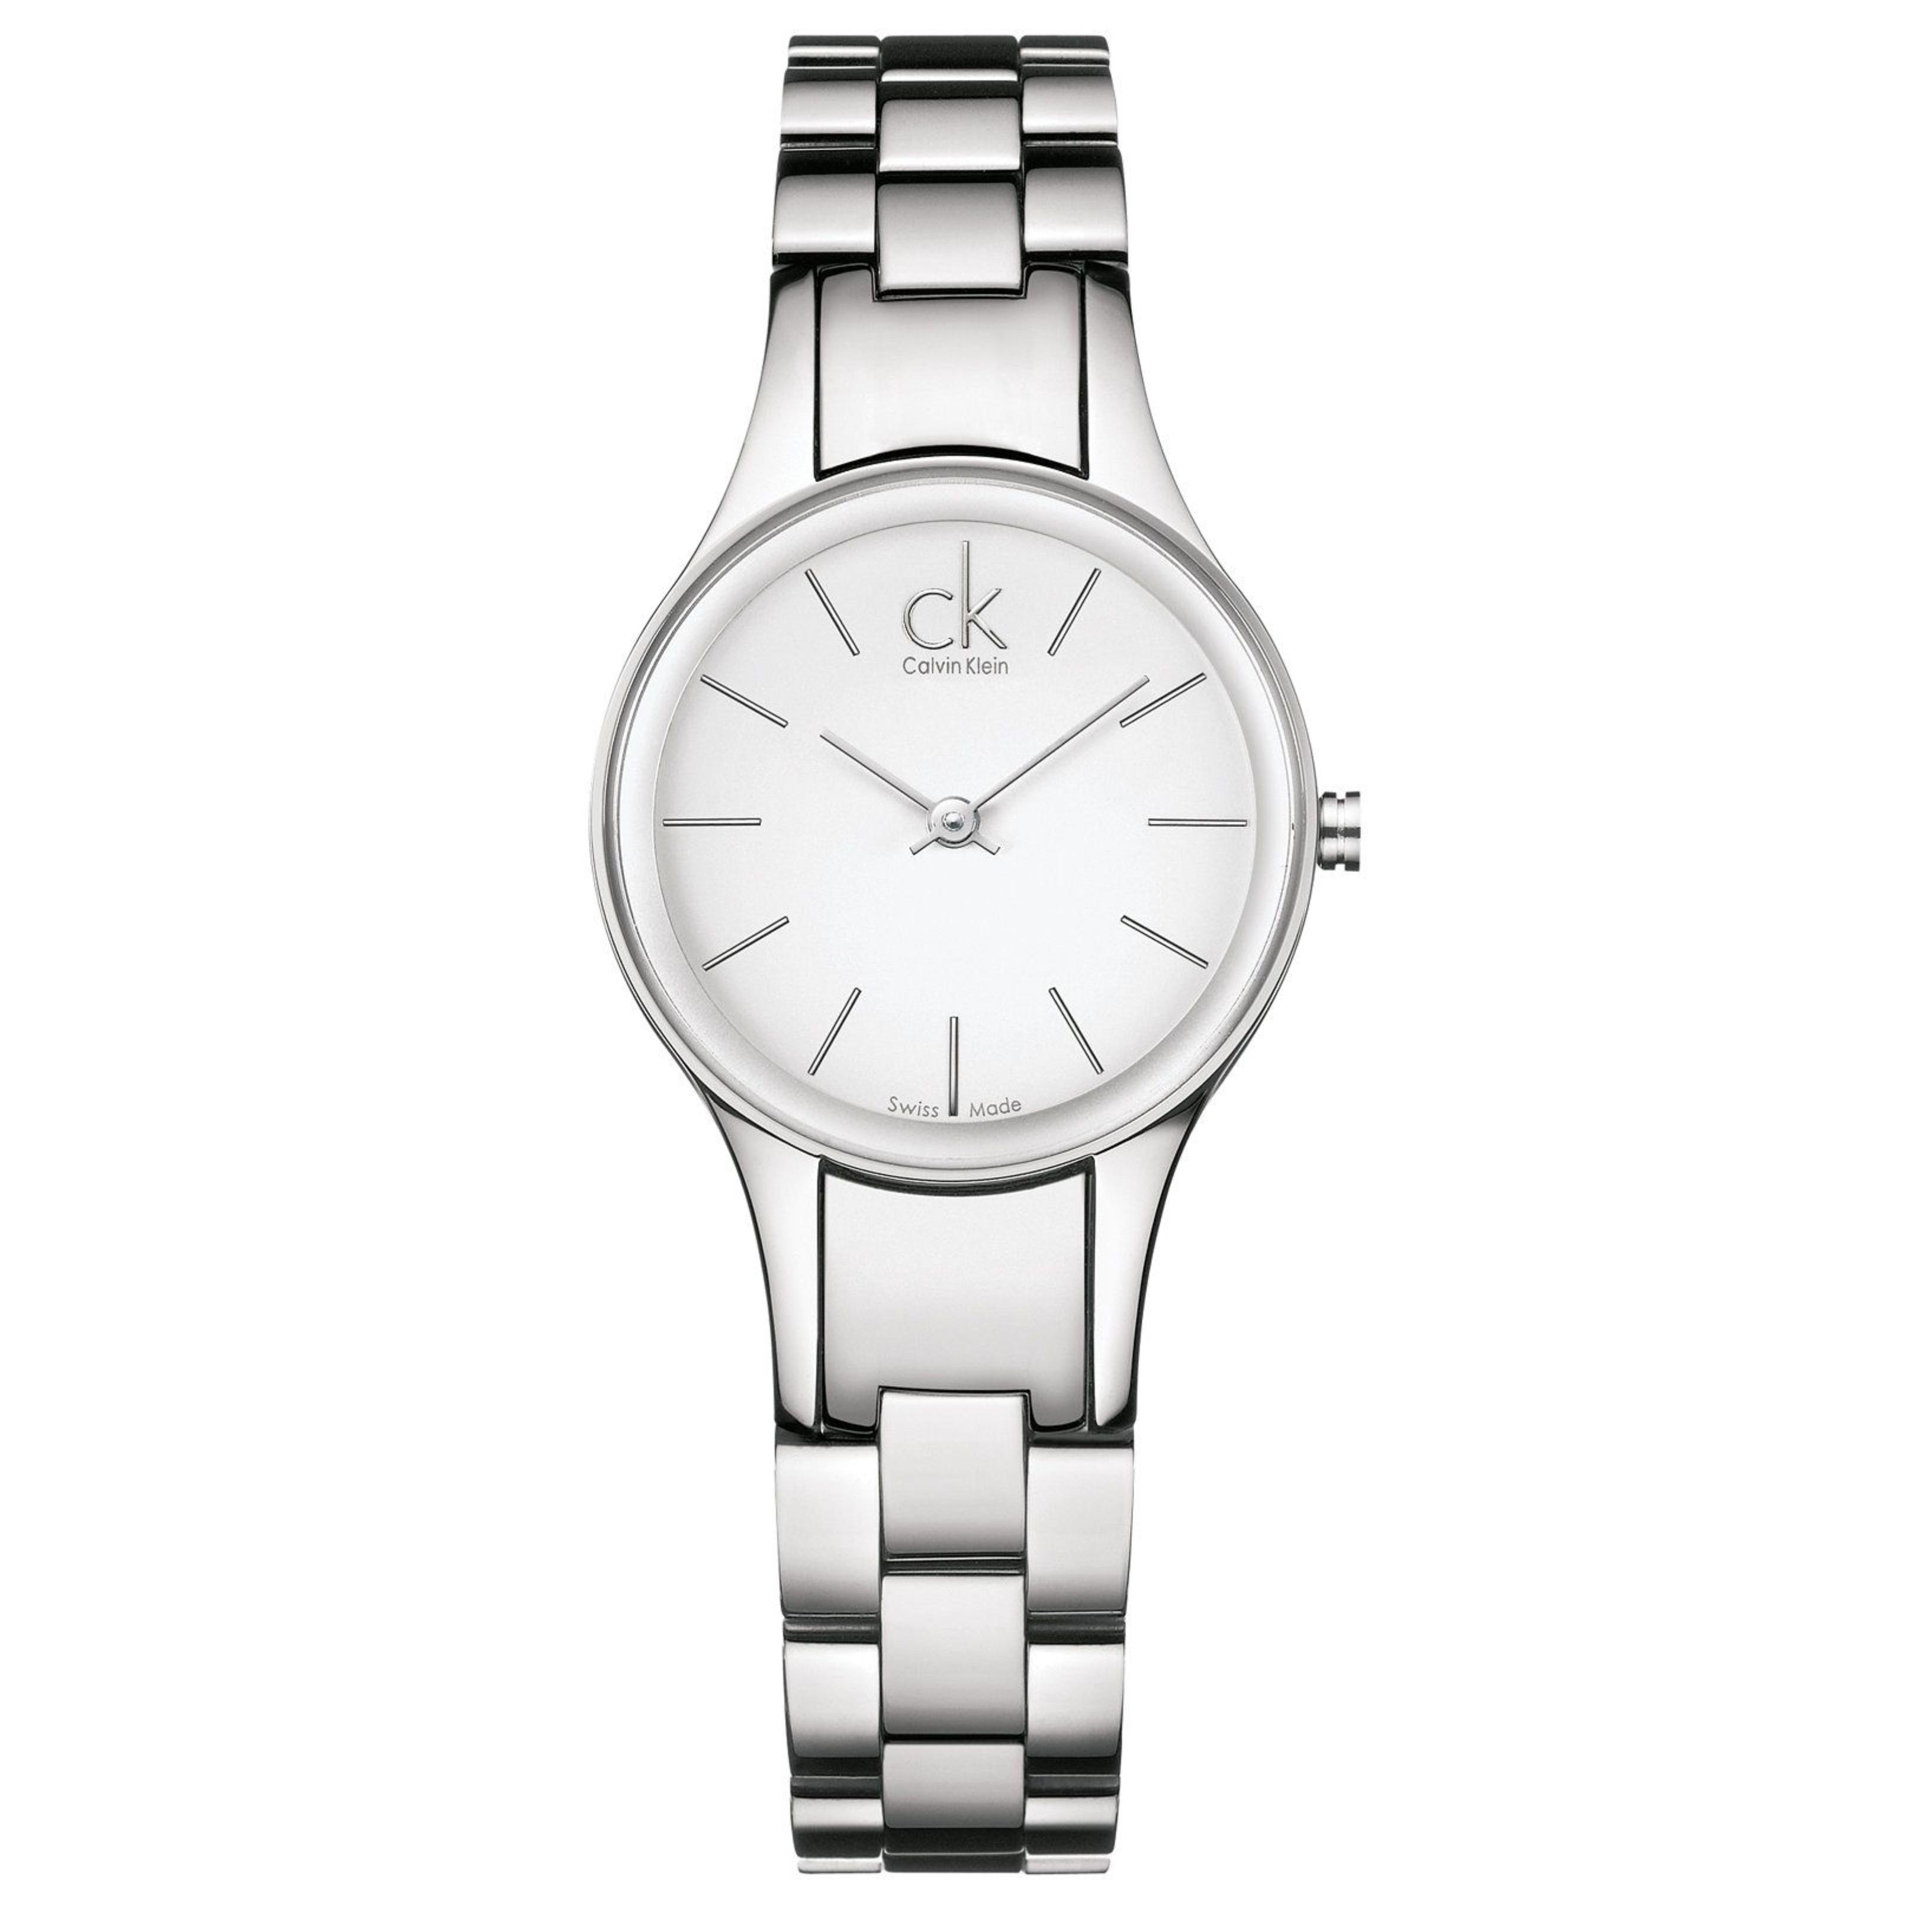 Calvin Klein Simplicity Ladies Watch K4323126 | White Round Dial | Stainless Steel